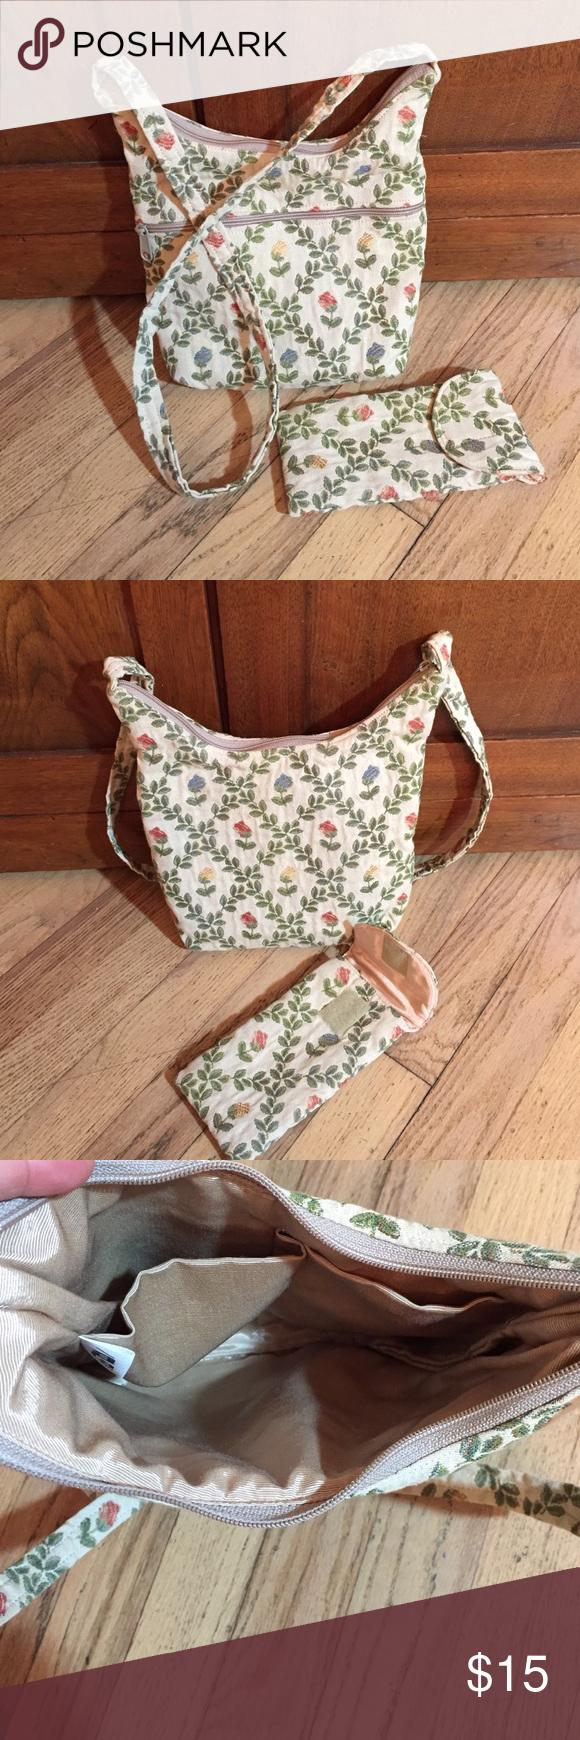 "Vintage floral shoulder bag and eyeglass case Fully lined bag is 10""x9"" with 17"" strap drop. Eyeglass case is 7.5""x 3.5"". Cotton. à la main Bags Shoulder Bags"